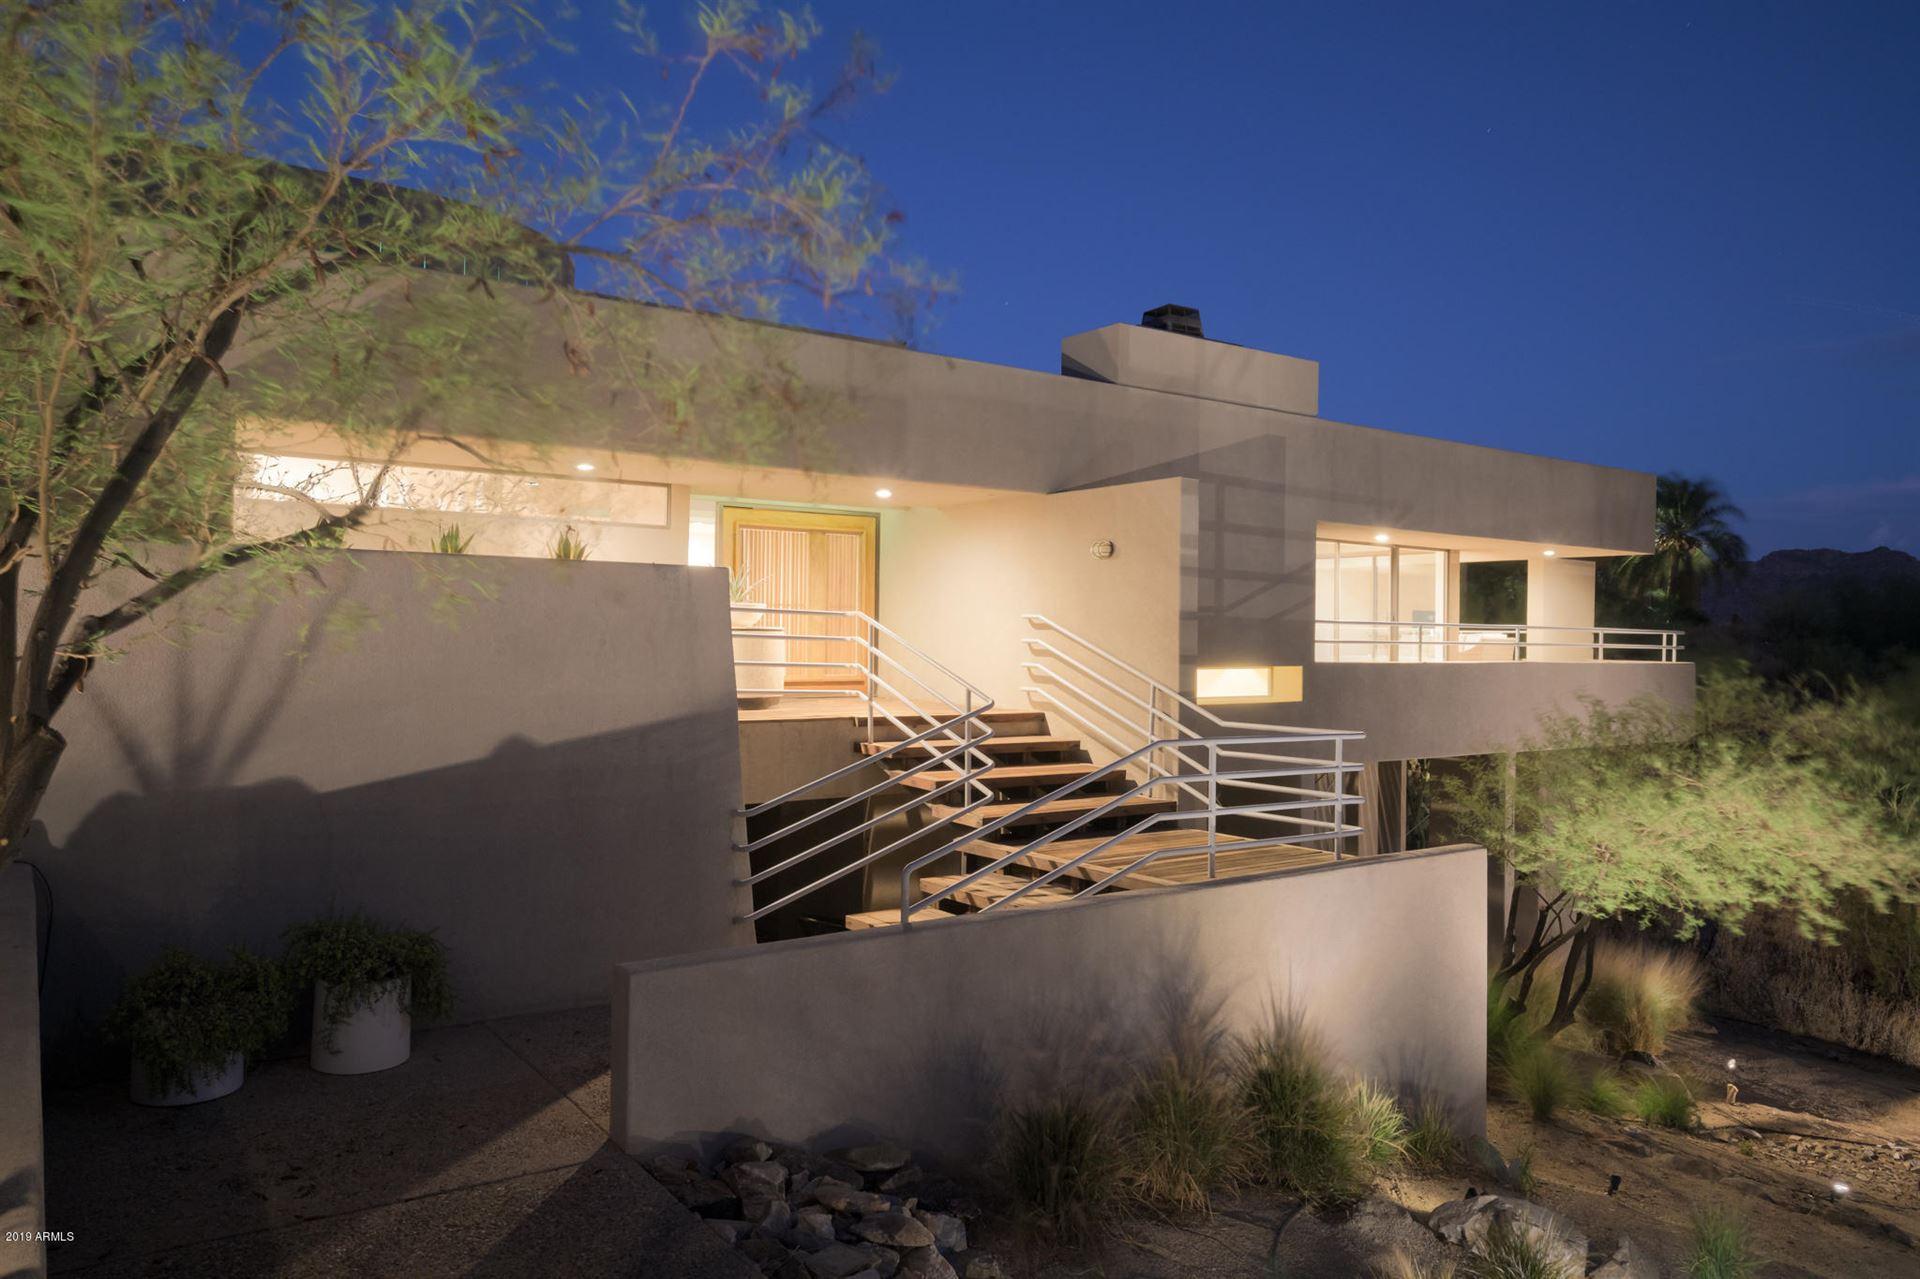 Photo of 7417 N Red Ledge Drive, Paradise Valley, AZ 85253 (MLS # 6250976)